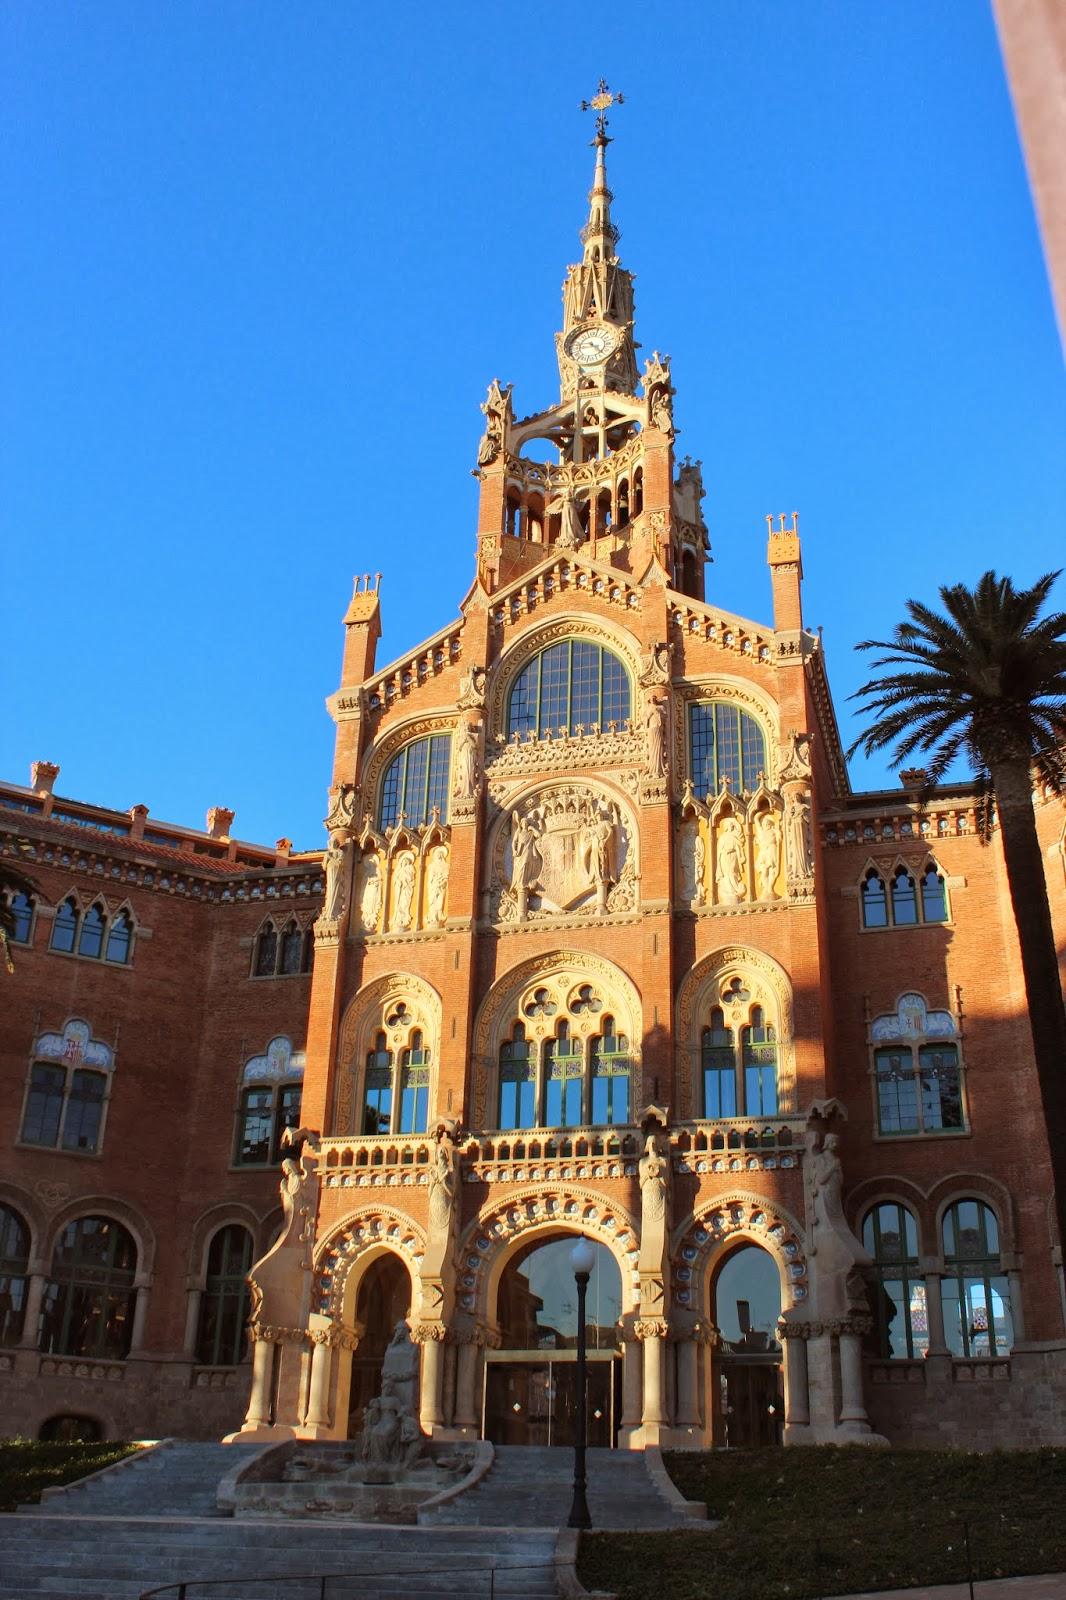 Fachada Hospital modernista de Barcelona